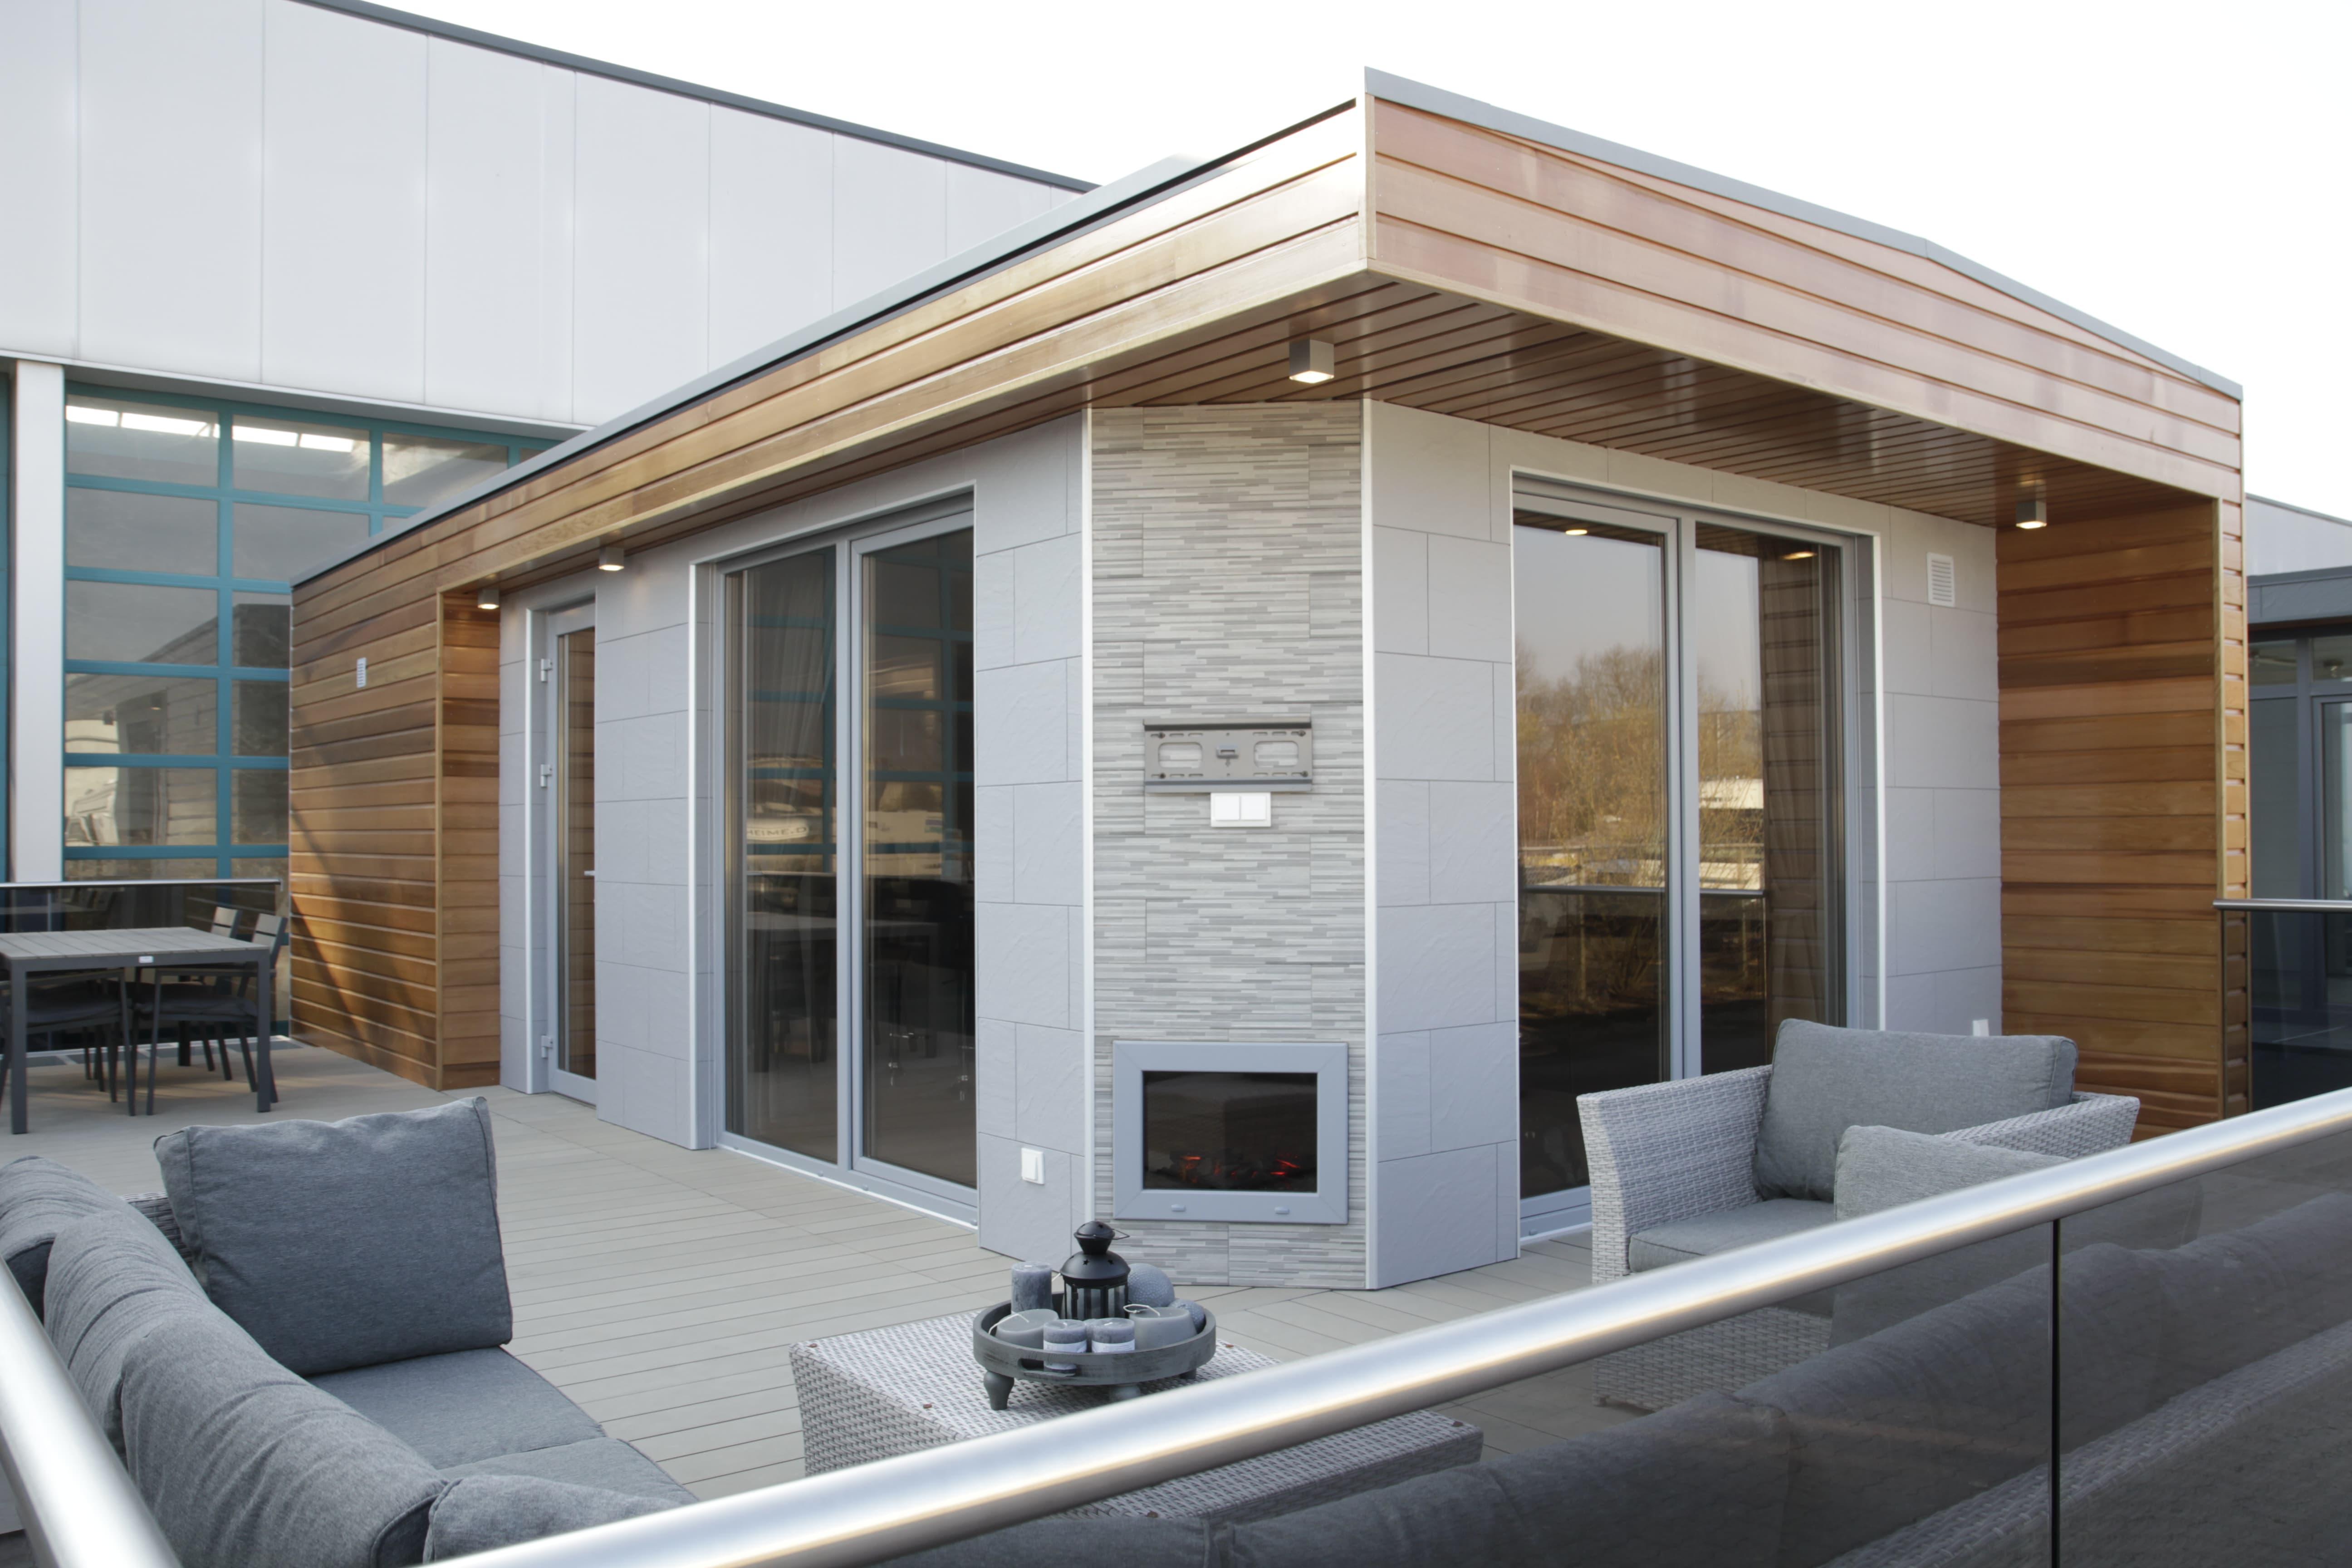 st lucia typ b hgb mobilheime. Black Bedroom Furniture Sets. Home Design Ideas